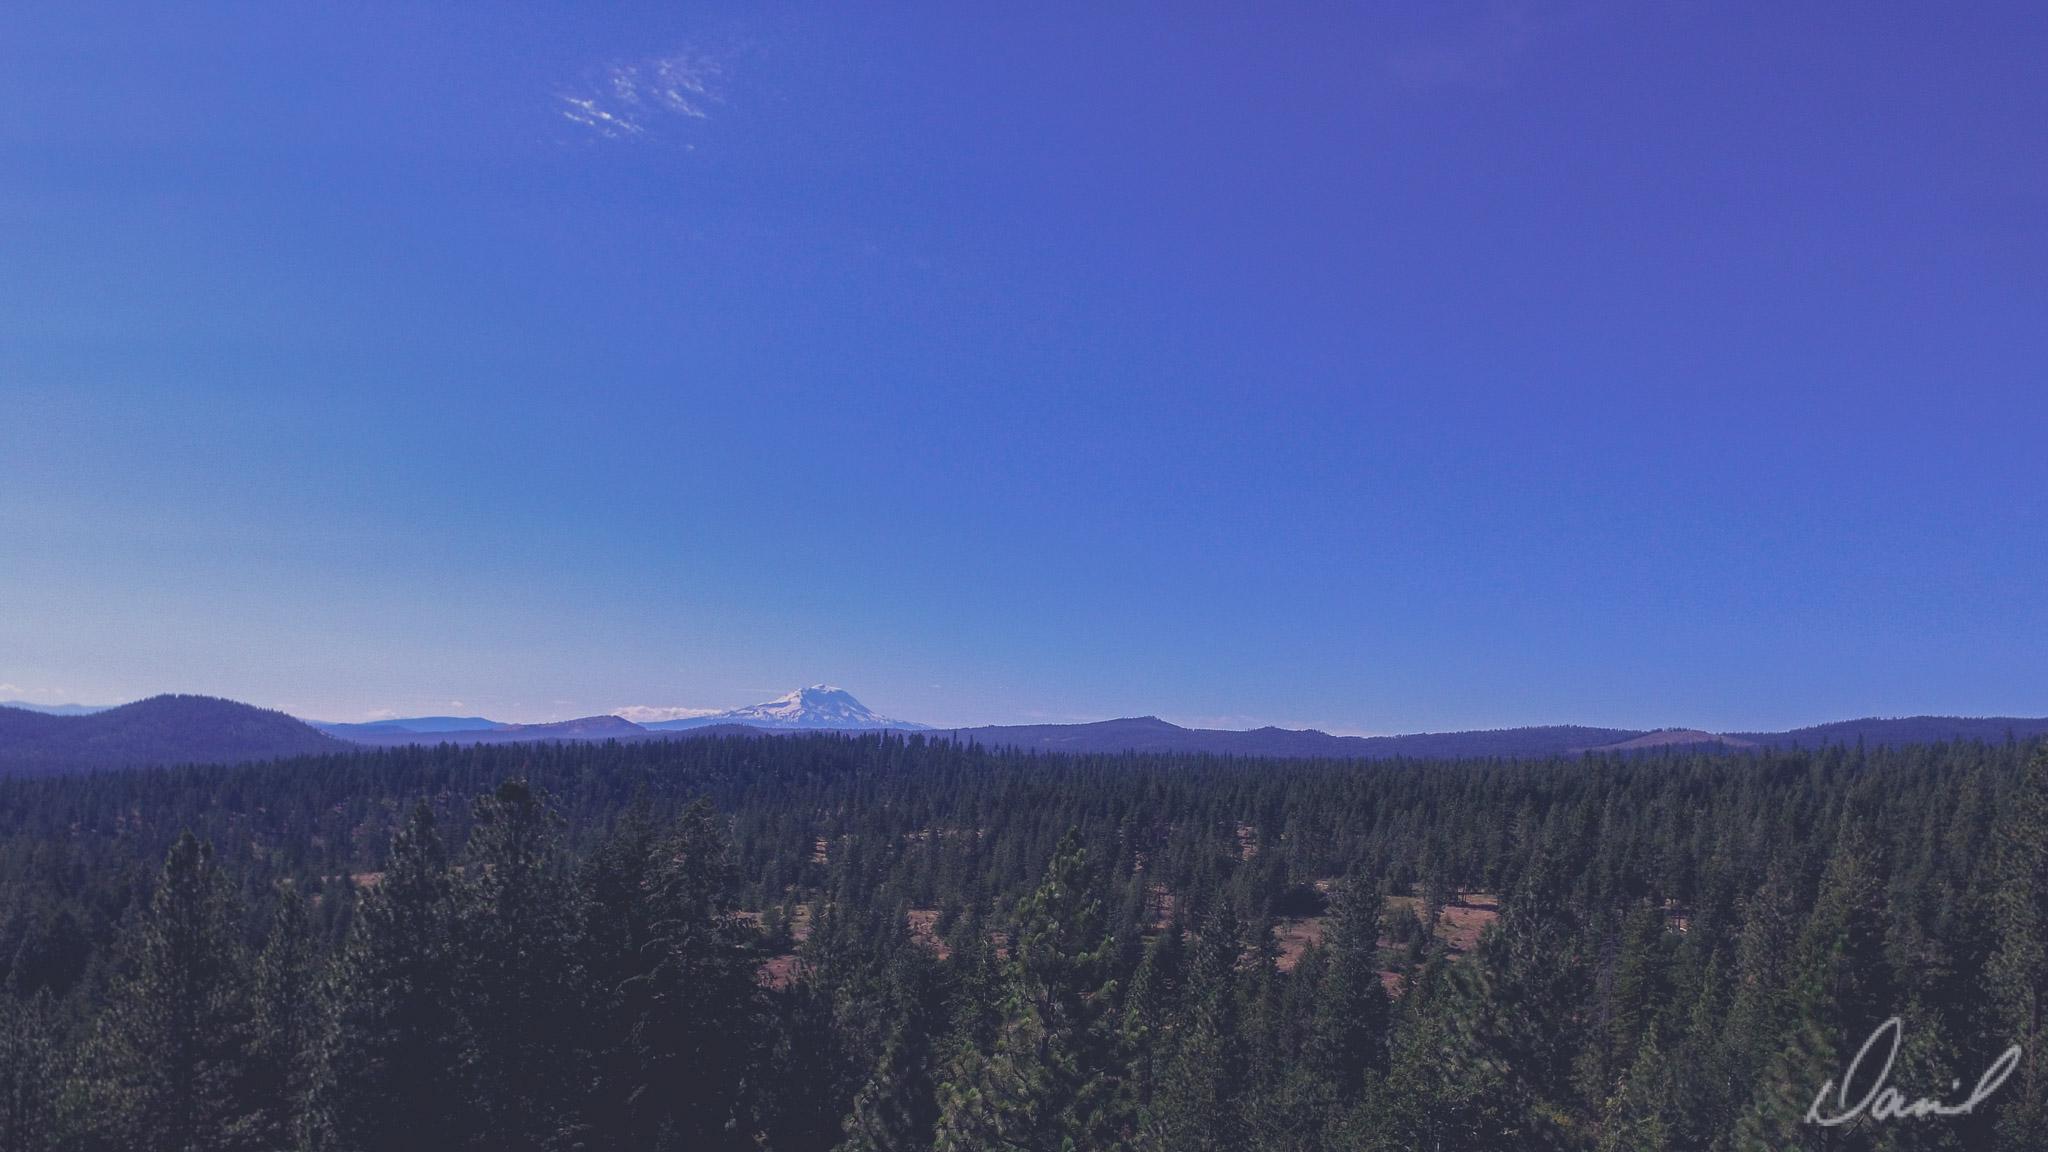 Mt Rainier in the distance